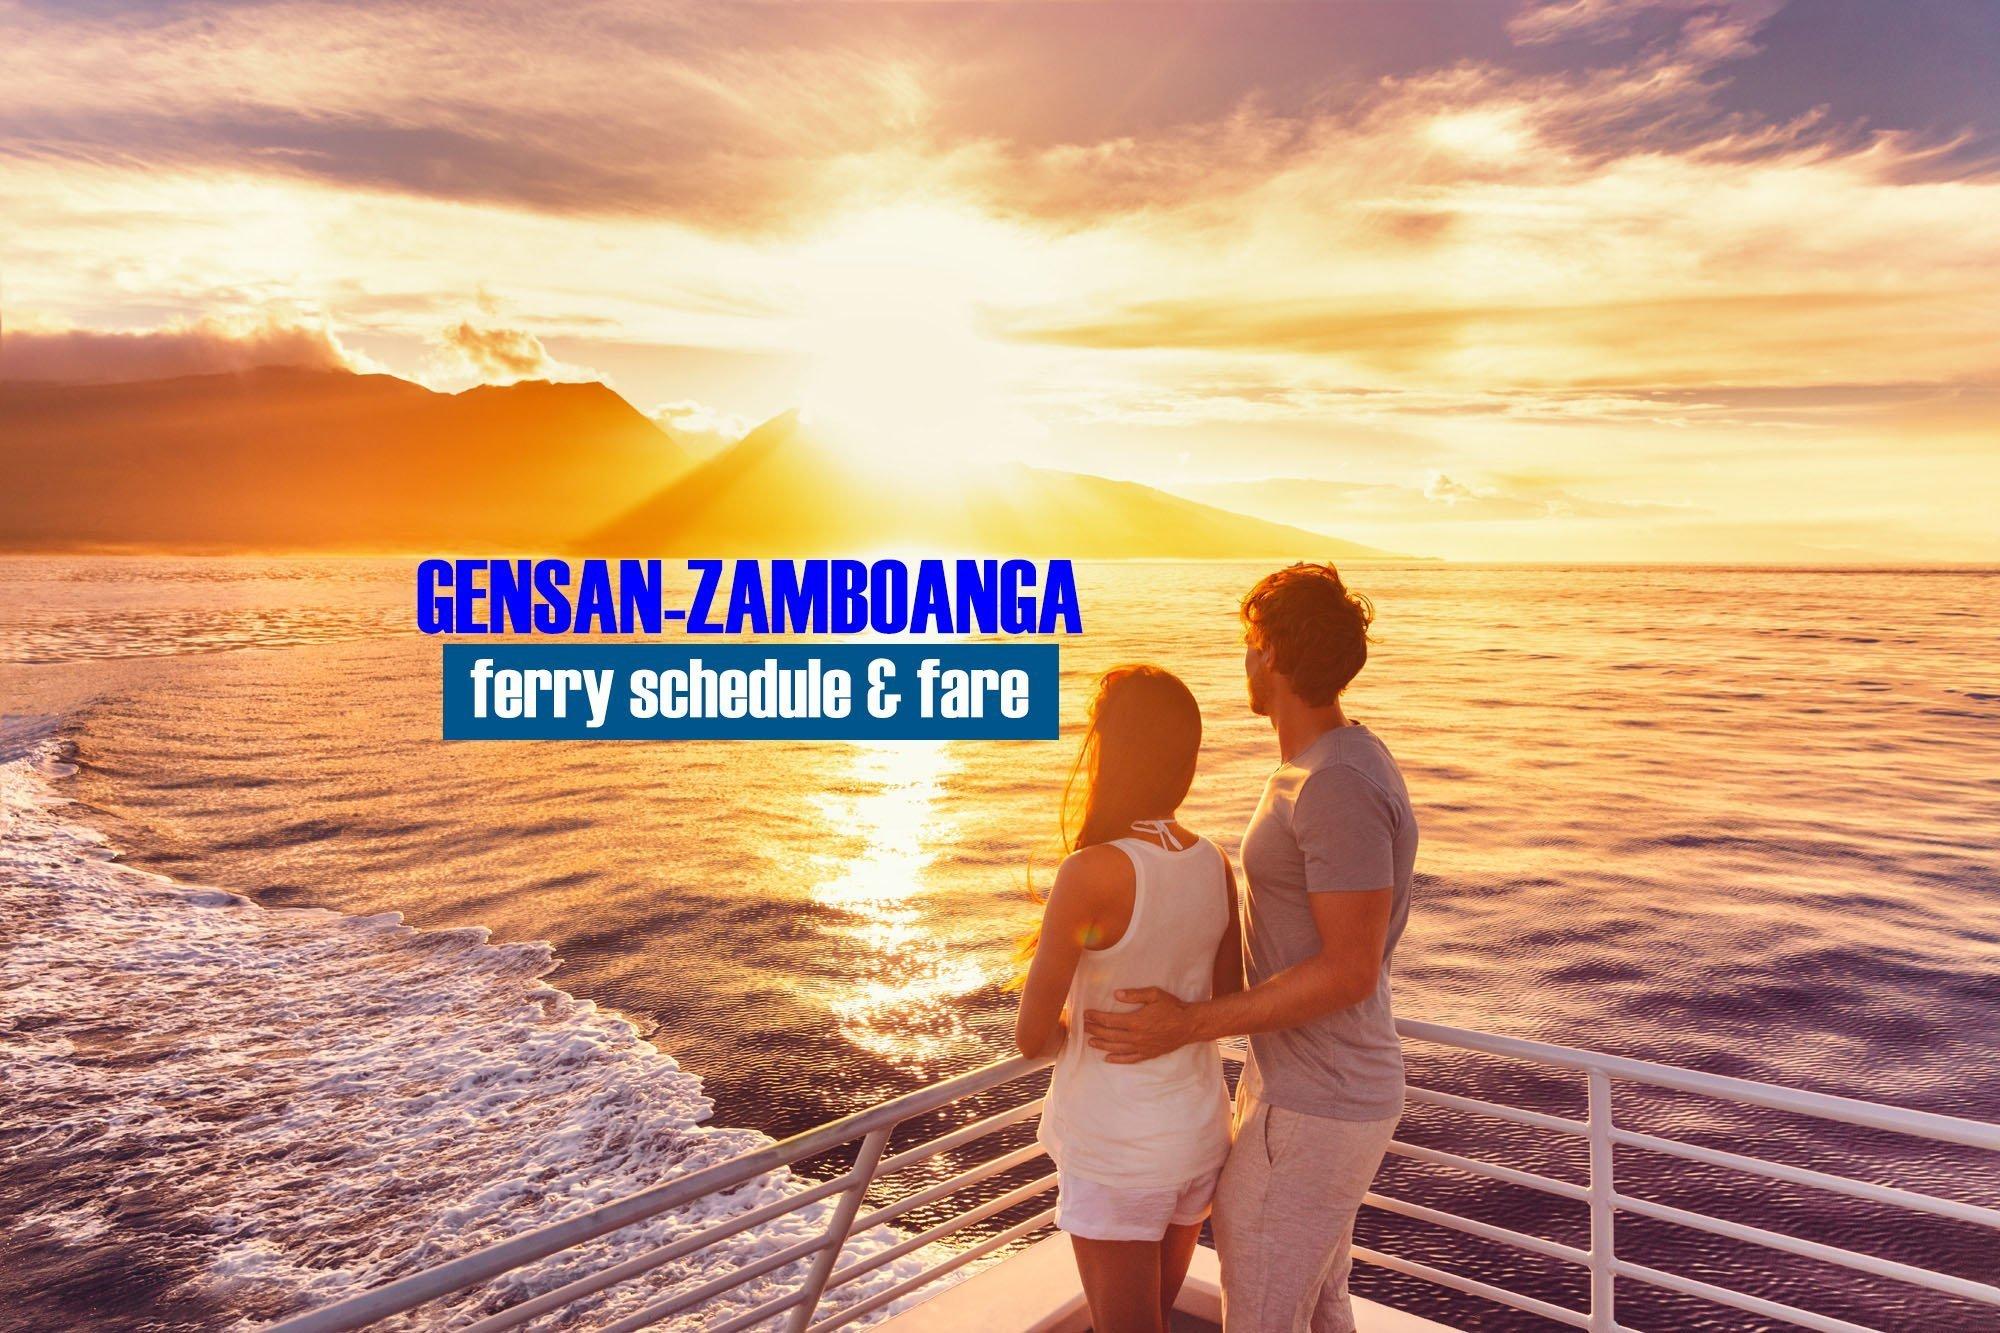 General Santos to Zamboanga: 2019 Boat Schedule & Fare